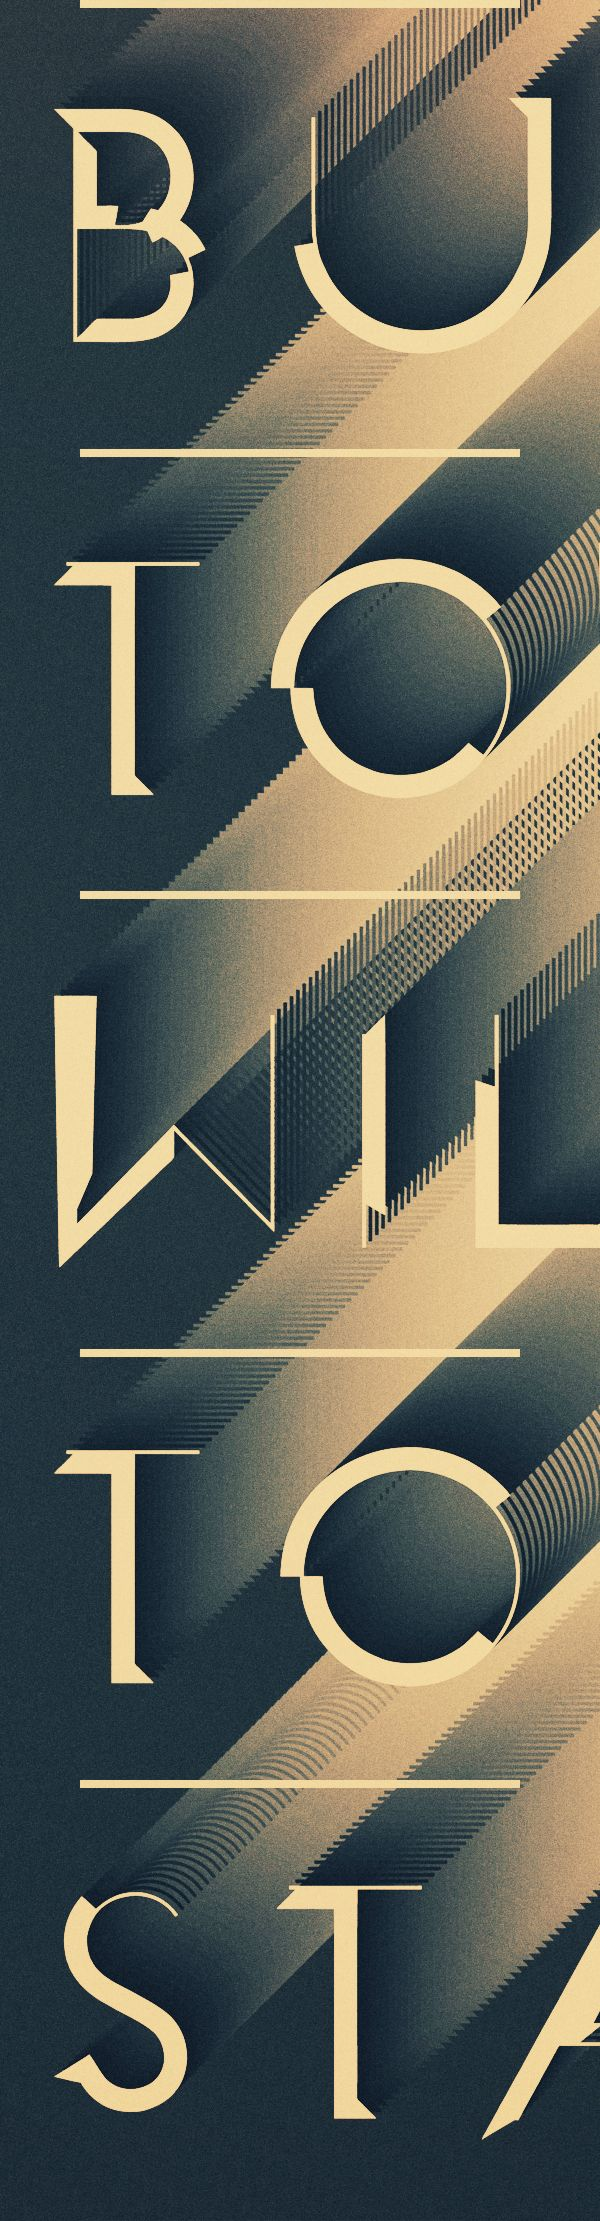 Atelier Olschinsky #atelierolschinsky #grafica #gradient #lettering #type #vintage #deco #futurismo